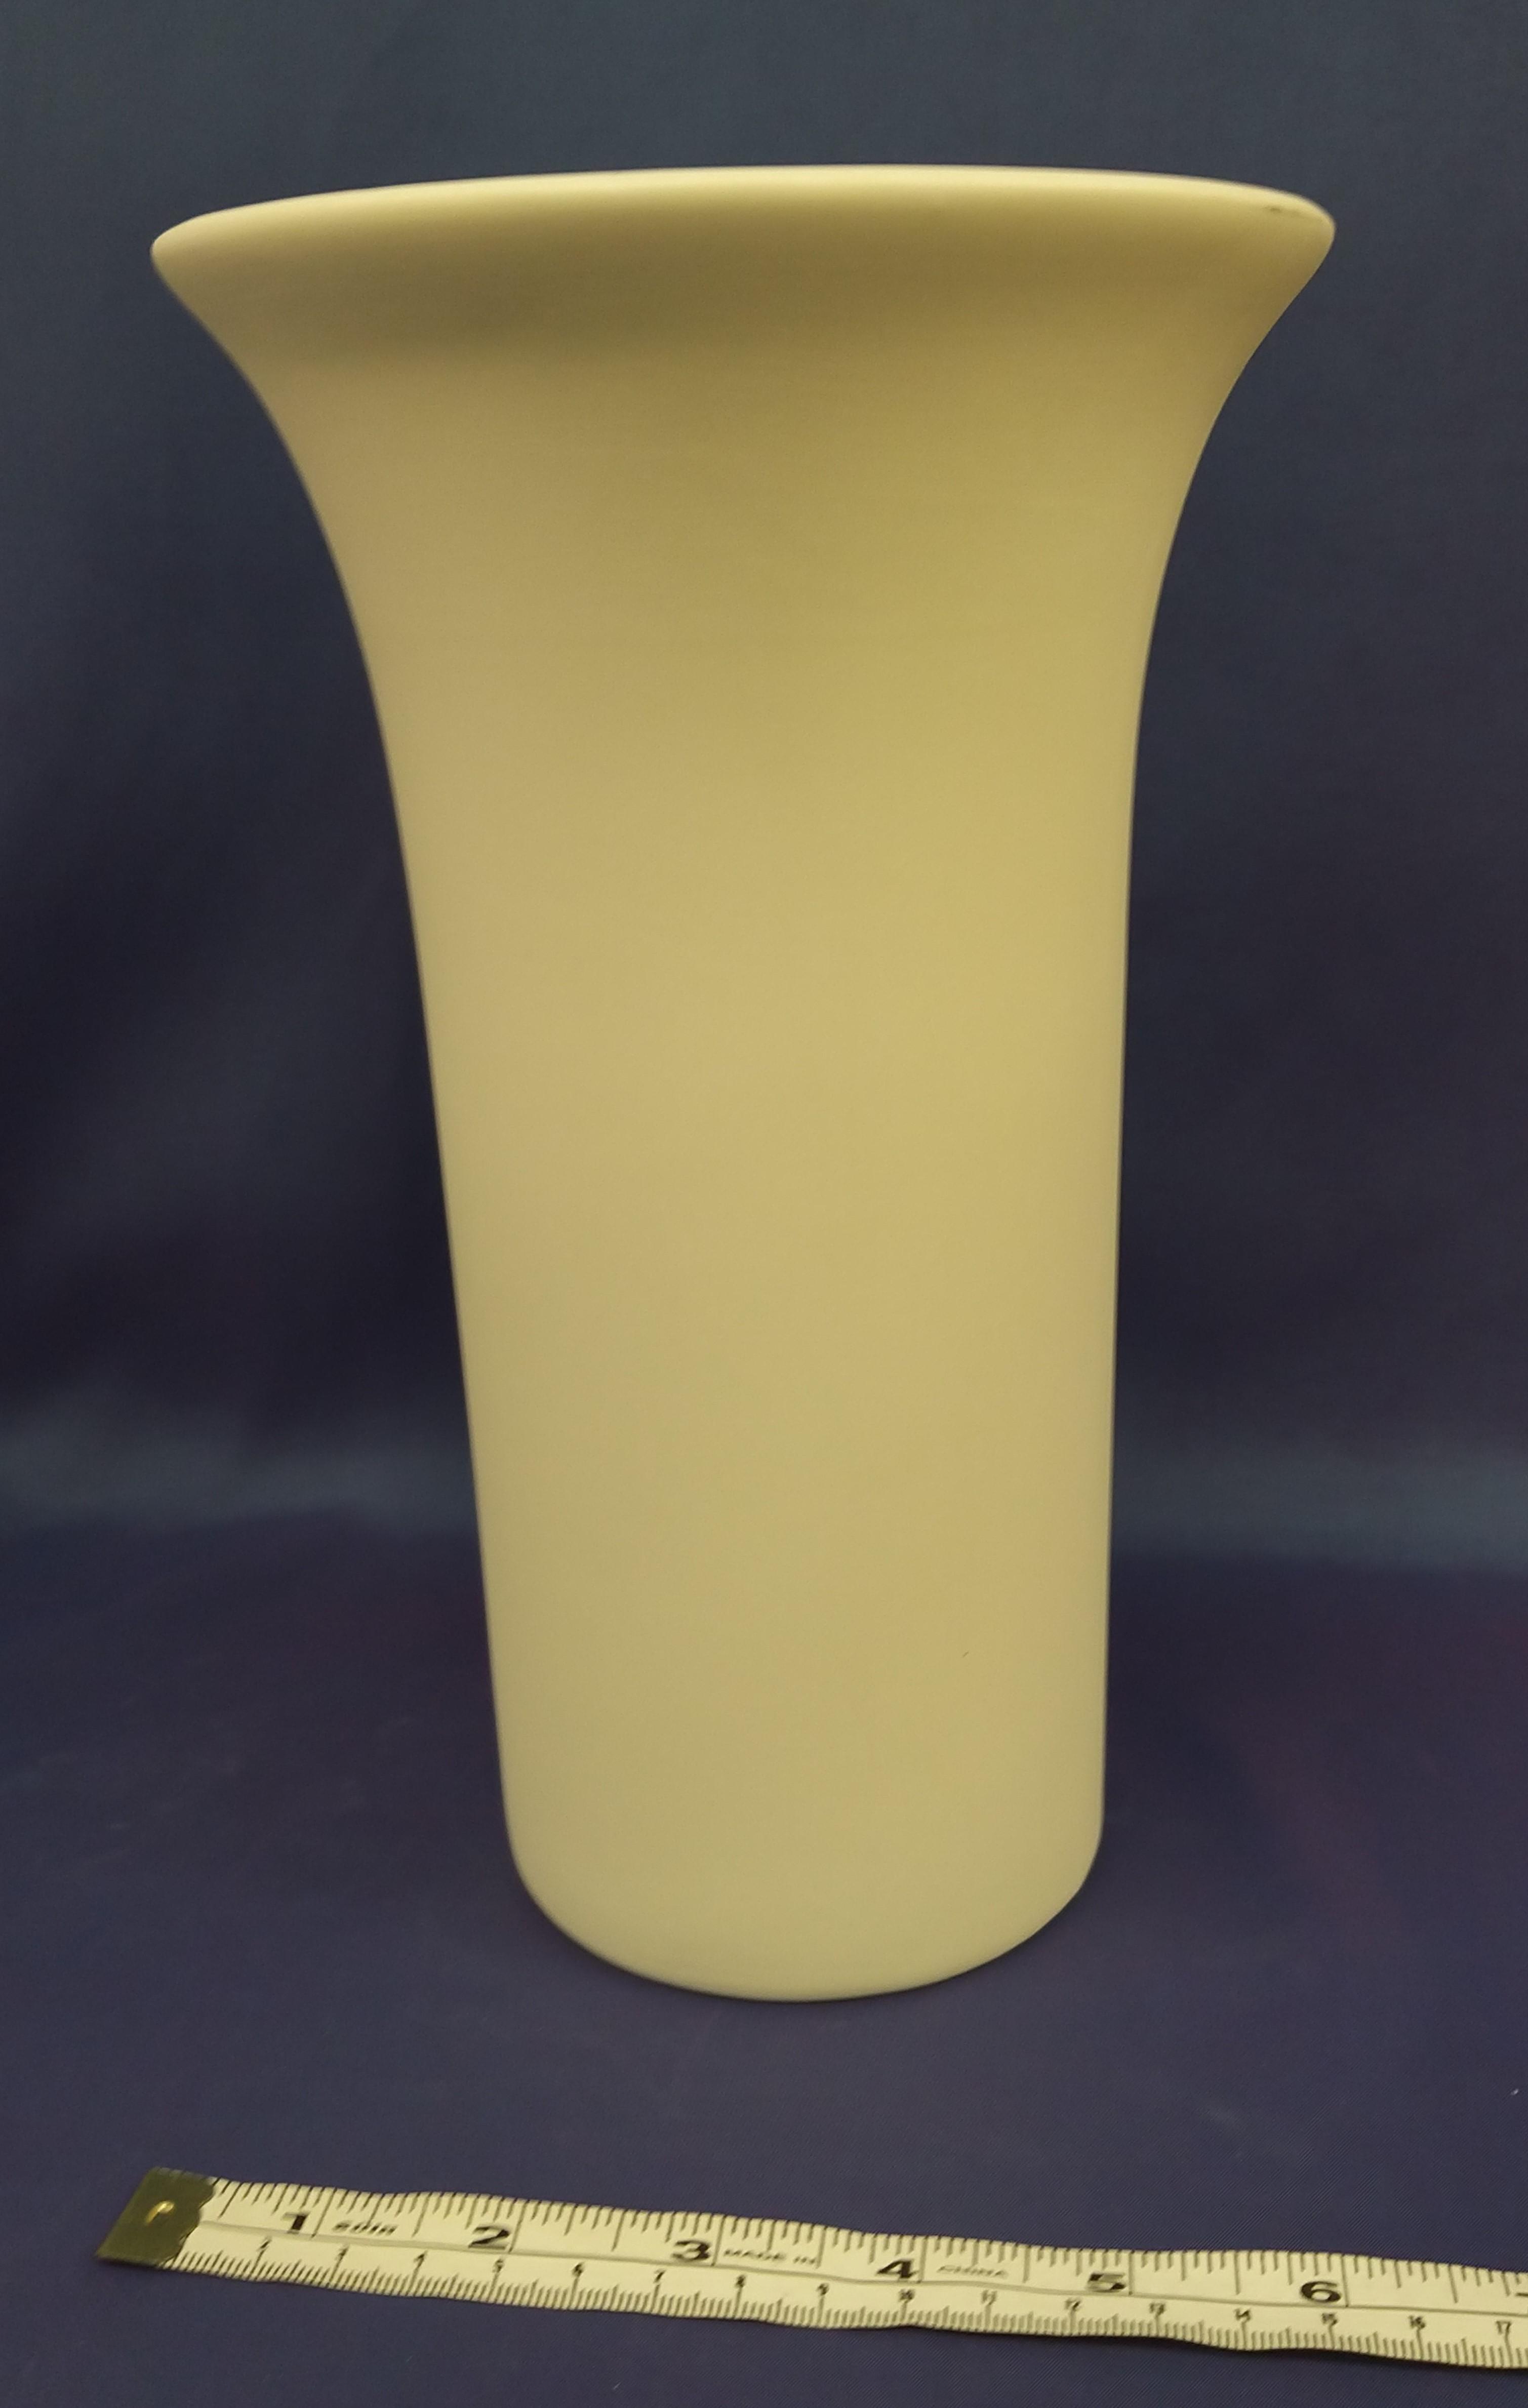 Large Vase with Trumpet Top (Clear glaze inside)